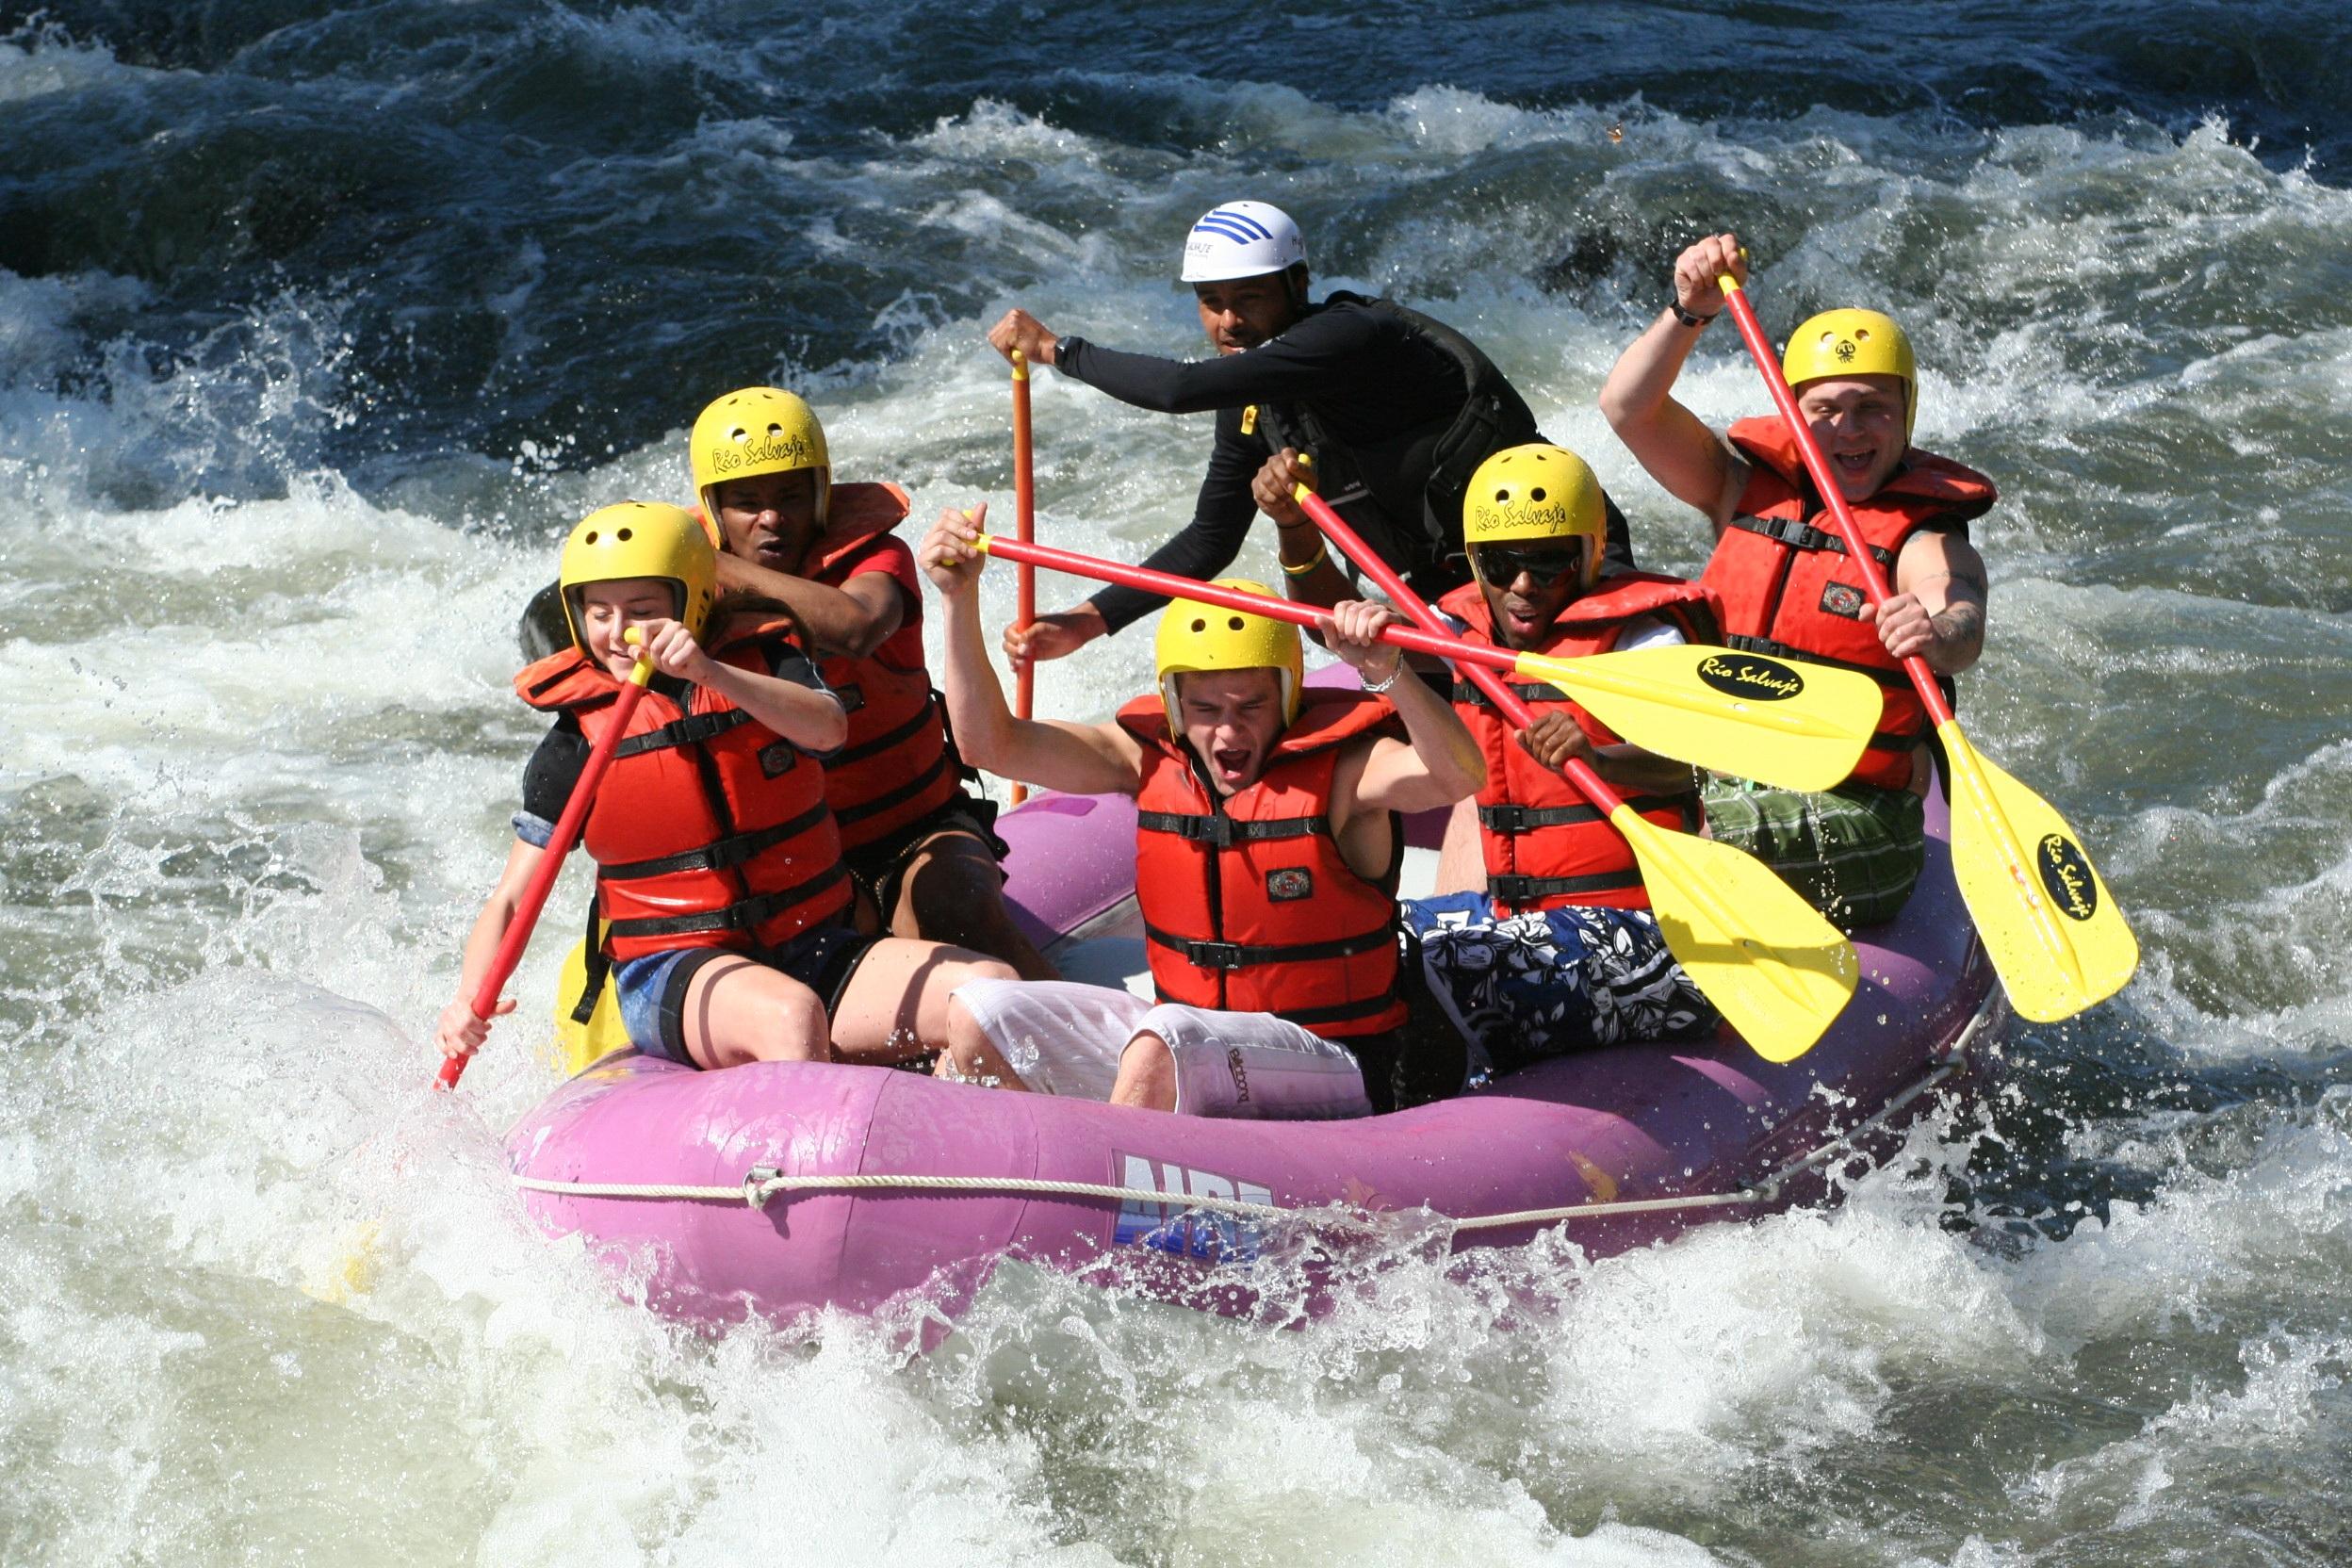 Fun white water rafting in an inflatable raft HD Wallpaper 2496x1664